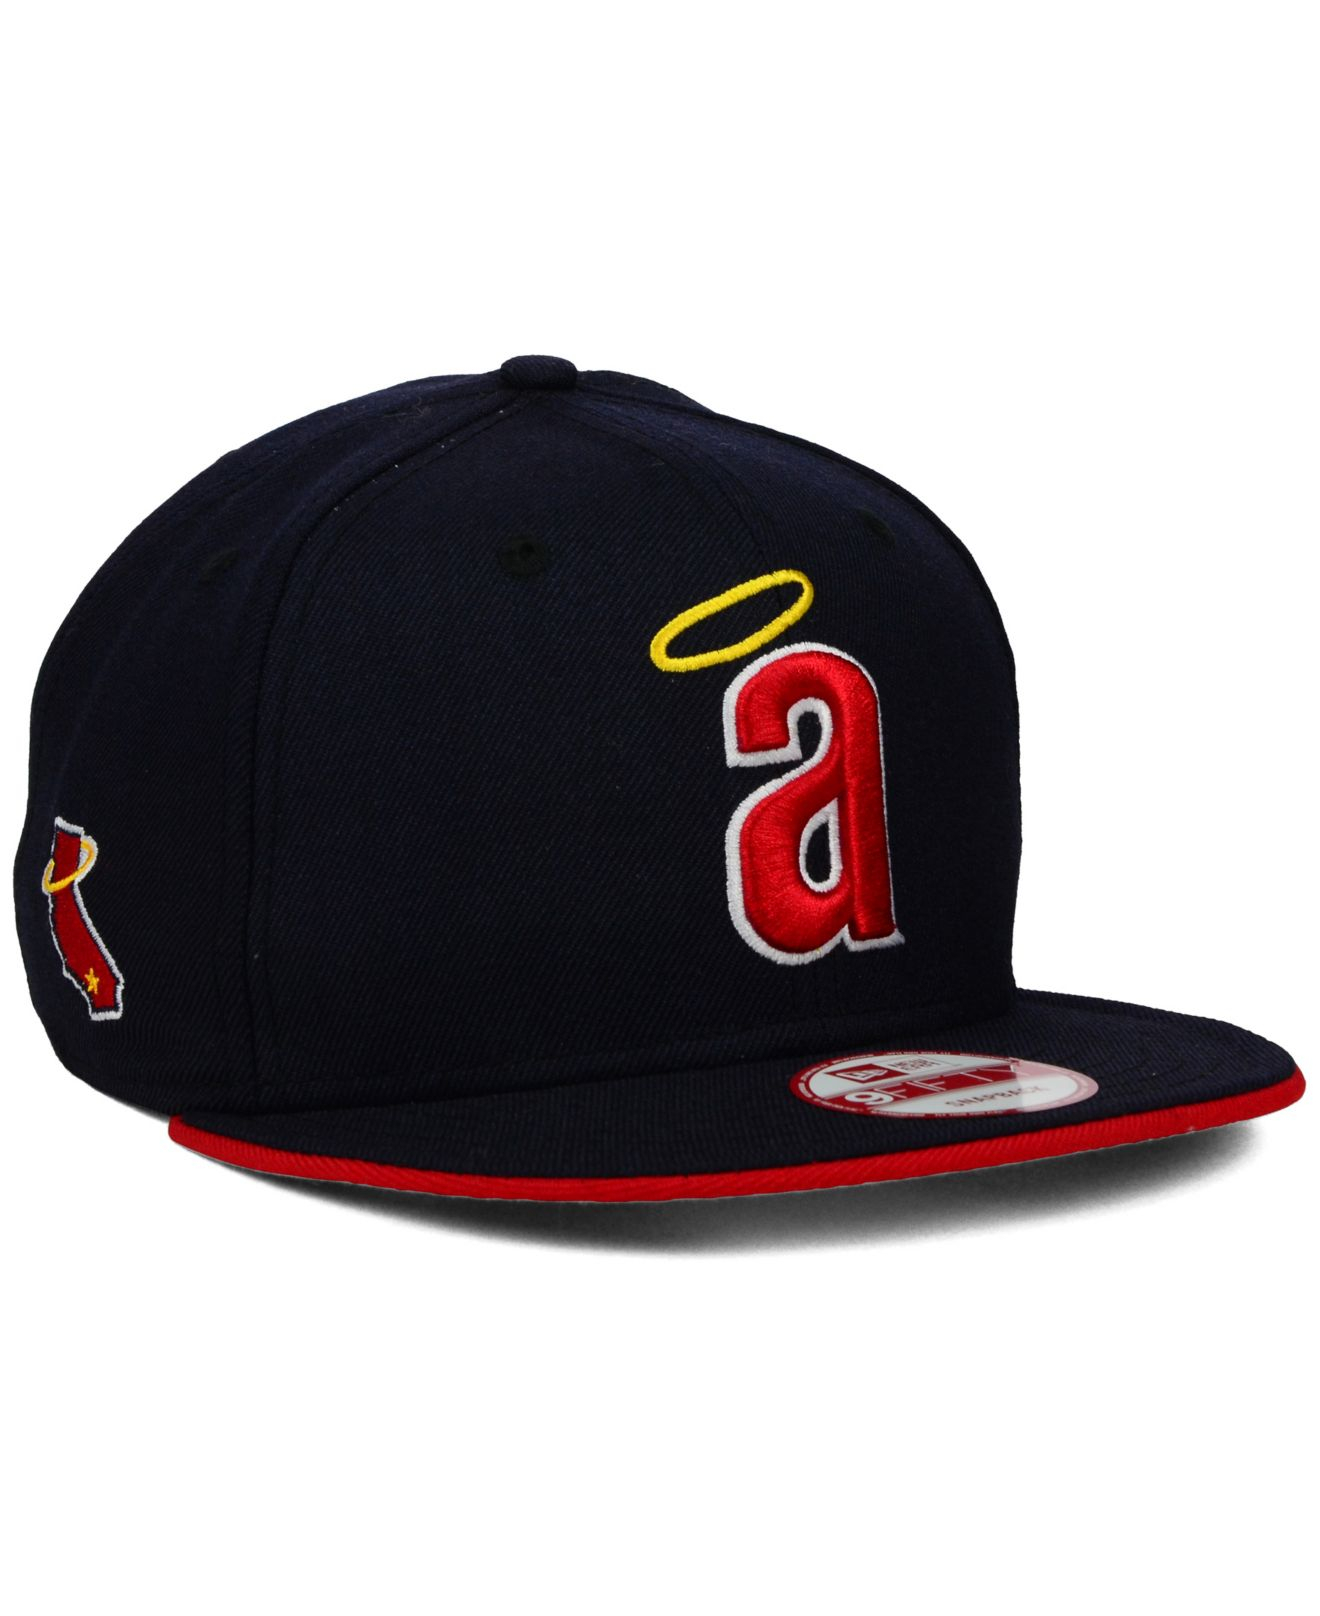 pretty nice 0f4e5 89e00 Lyst - KTZ Los Angeles Angels Of Anaheim Coop Flip 9fifty Snapback ...